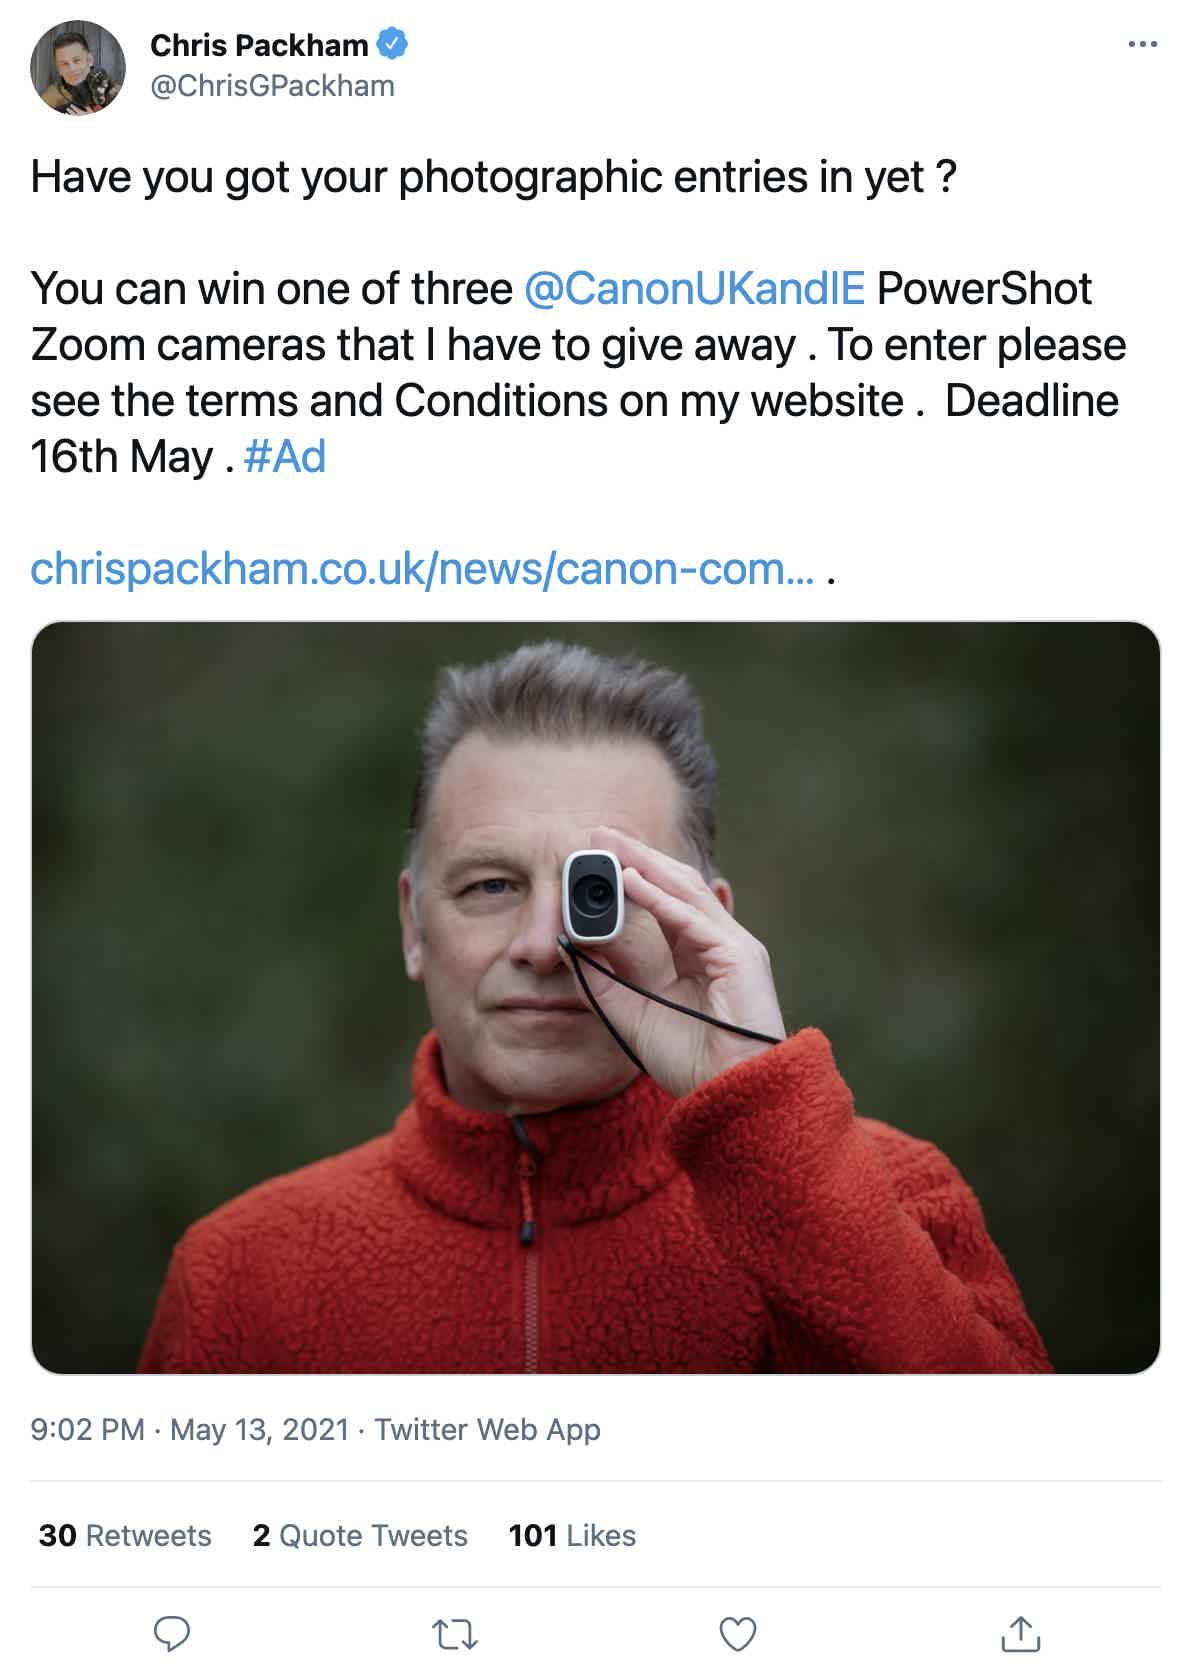 Chris Packham Camera Giveaway